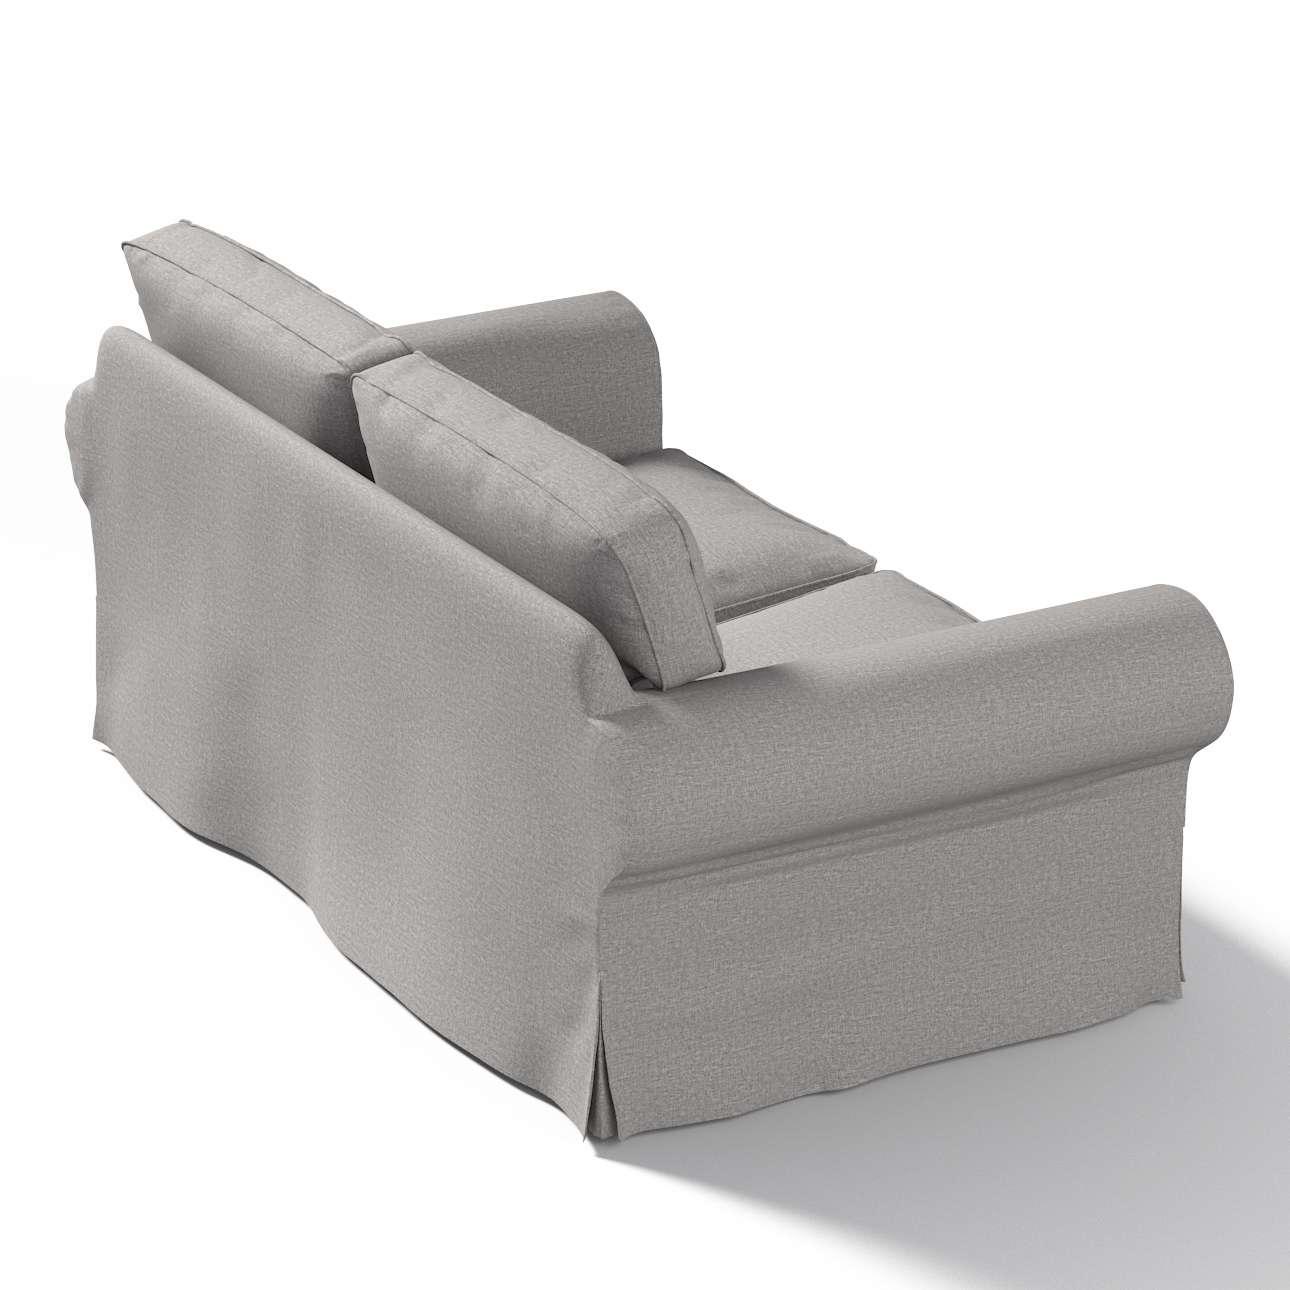 Ektorp 2-Sitzer Schlafsofabezug  ALTES Modell Sofabezug Ektorp 2-Sitzer Schlafsofa altes Modell von der Kollektion Edinburgh , Stoff: 115-81